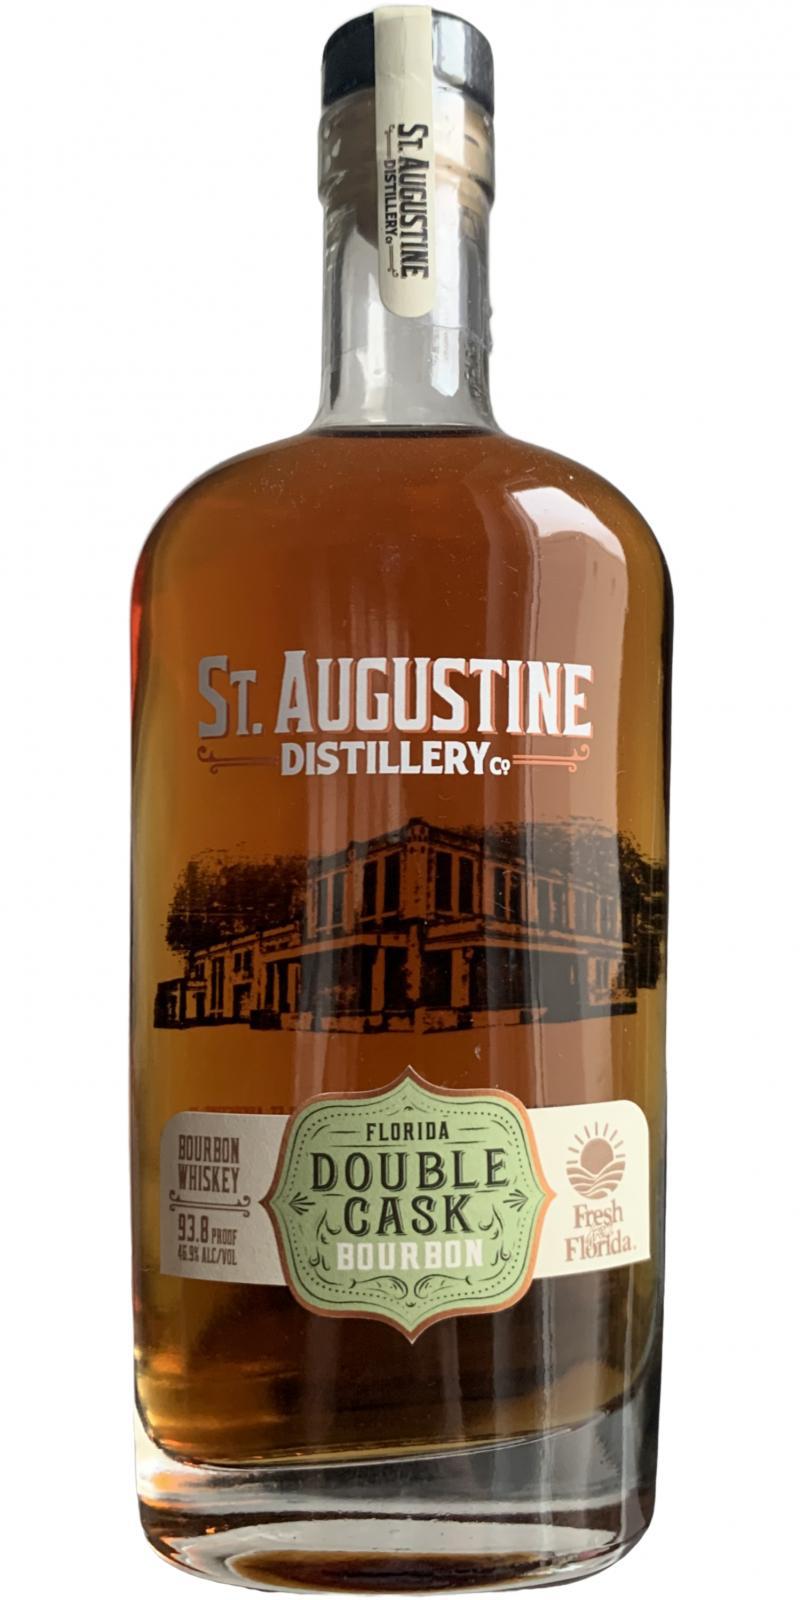 St. Augustine Double Cask